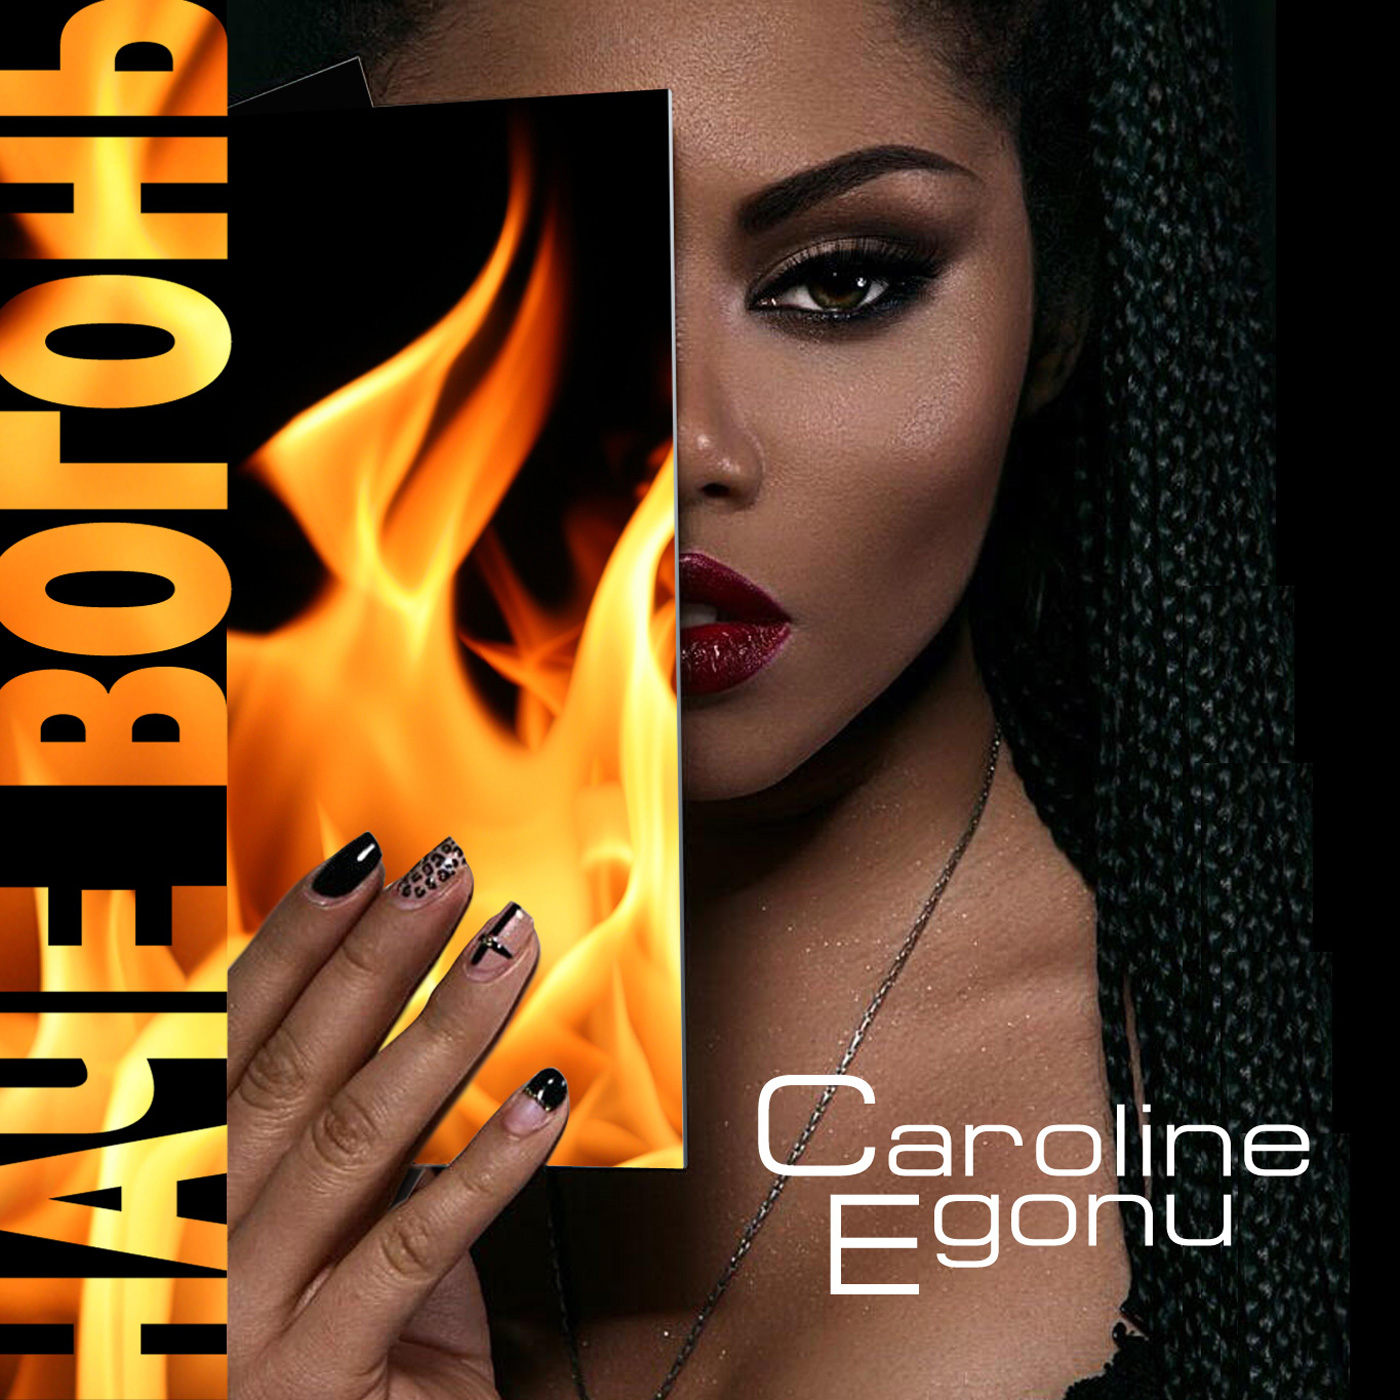 Caroline Egonu - Наче вогонь | Музика - екосистема Сузір'я Україна